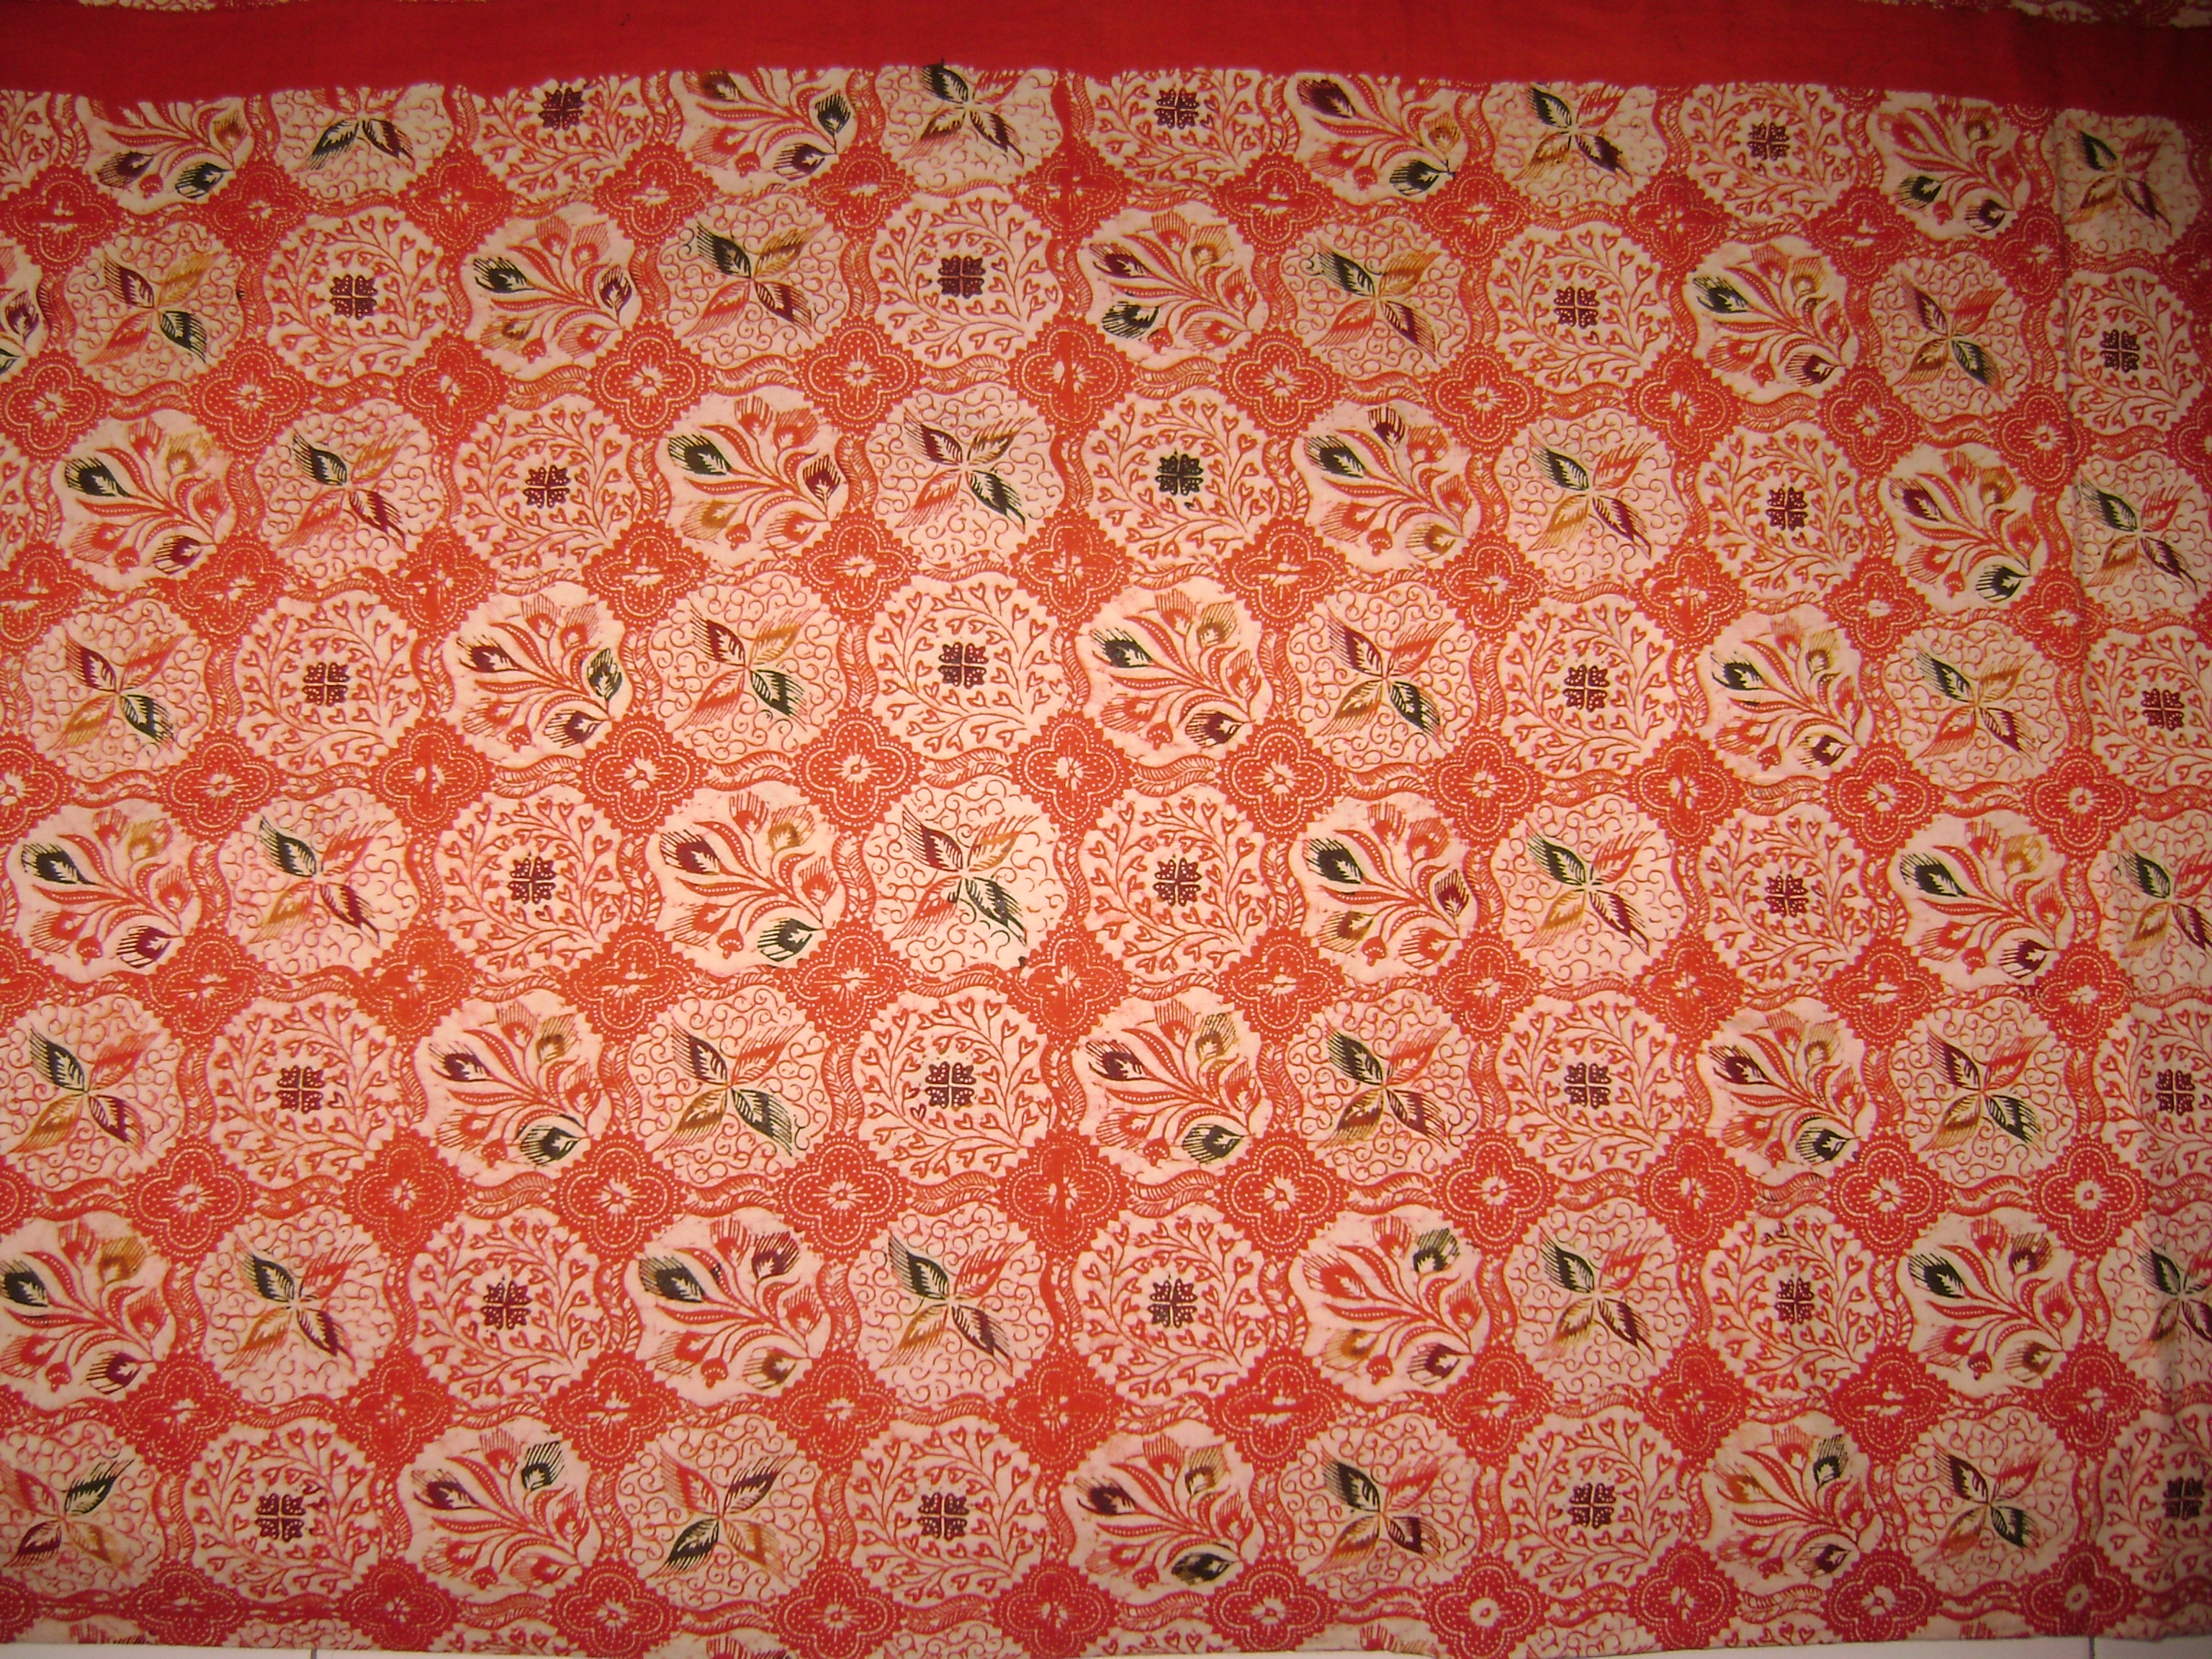 Gambar Batik Madura